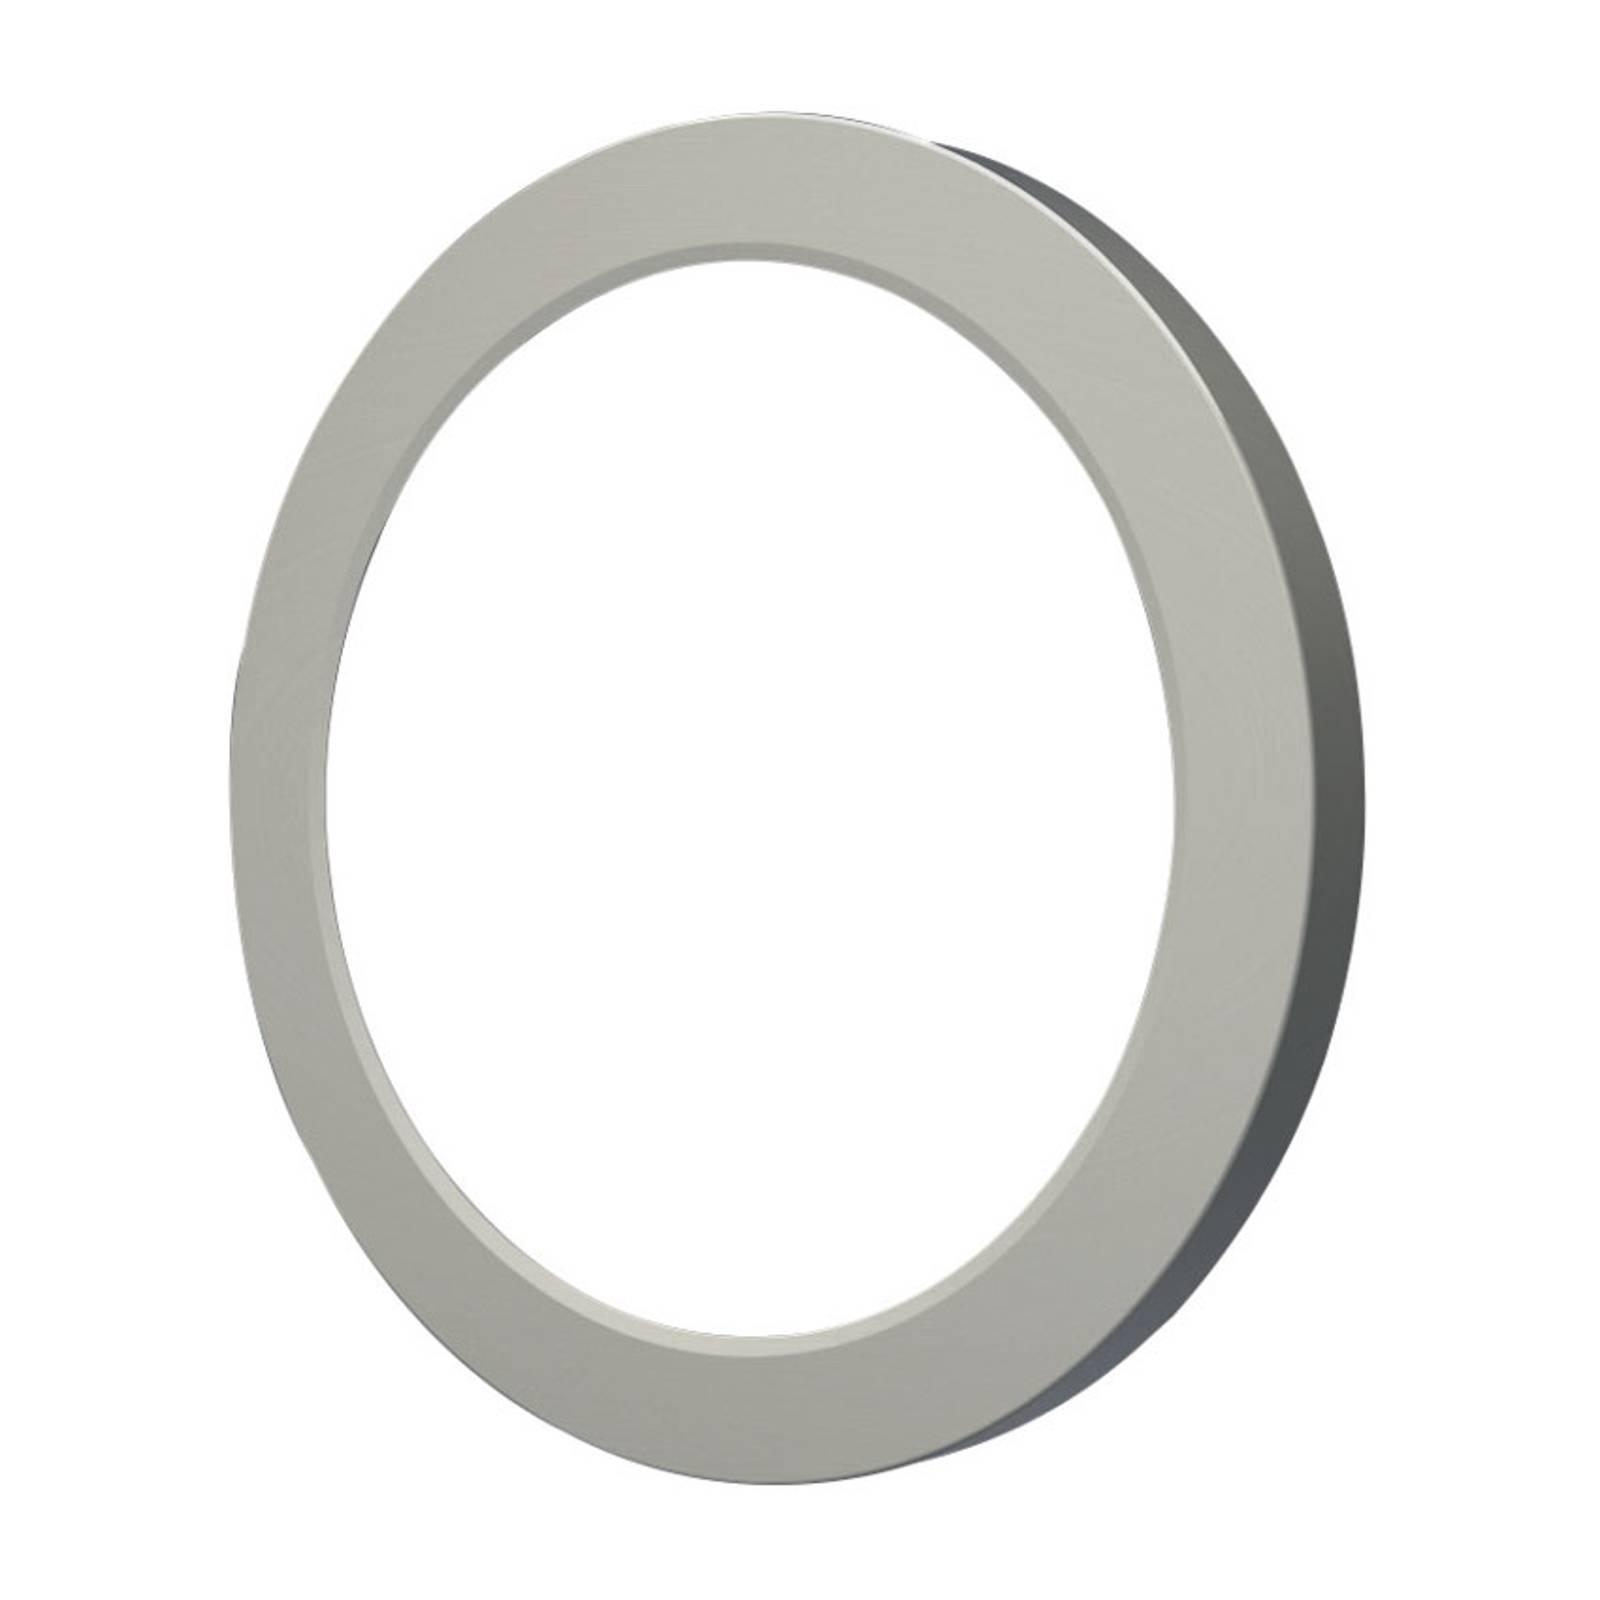 Megatron Pano magnetic cover round Ø21.7 cm